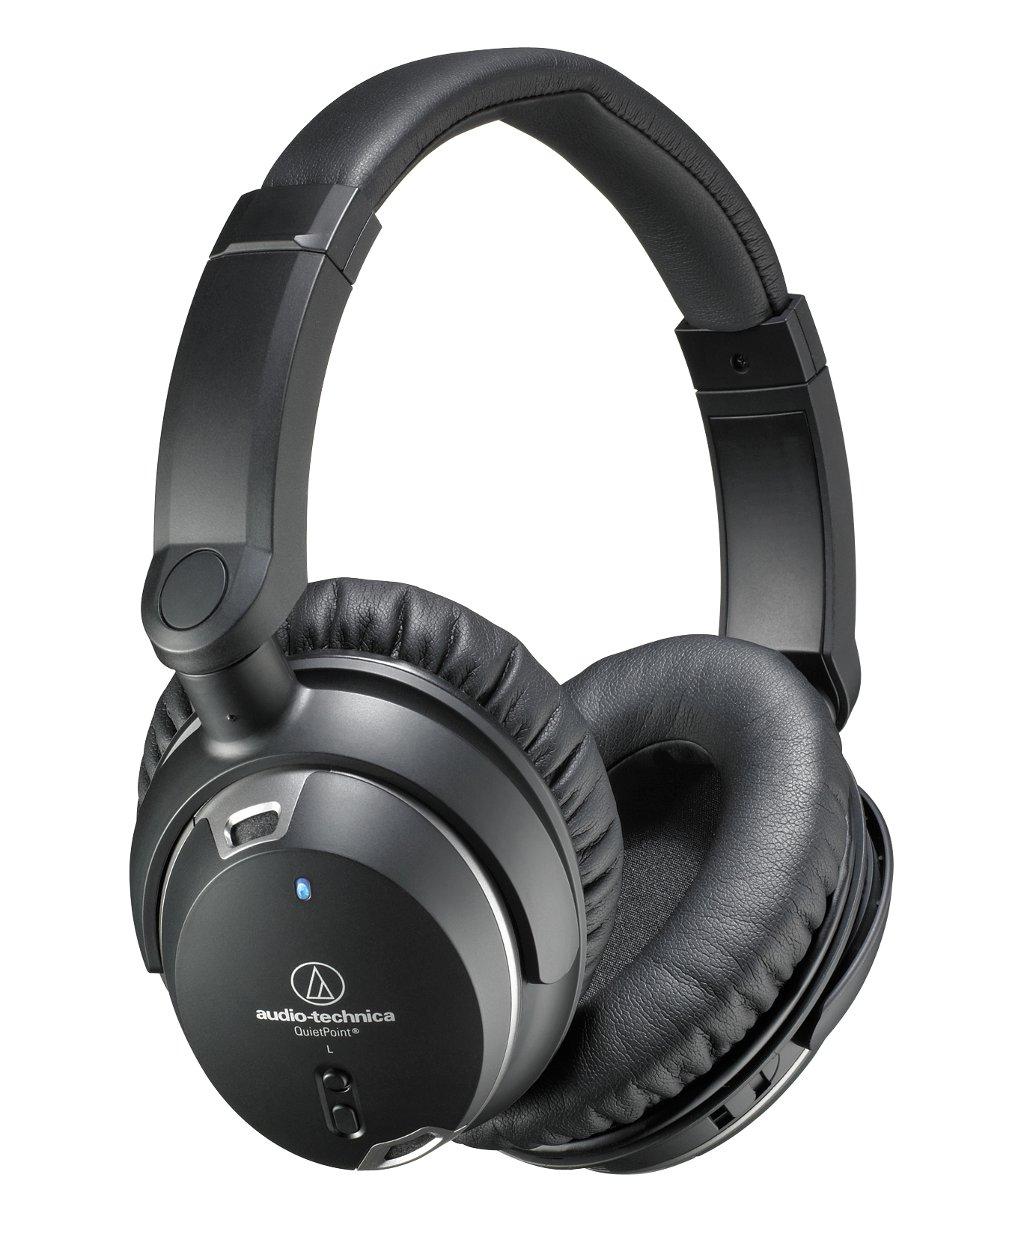 Phone Best Headphones For Android Phones 2013 best headphones under 300 audio technica ath anc9 quietpoint noise cancelling headphones